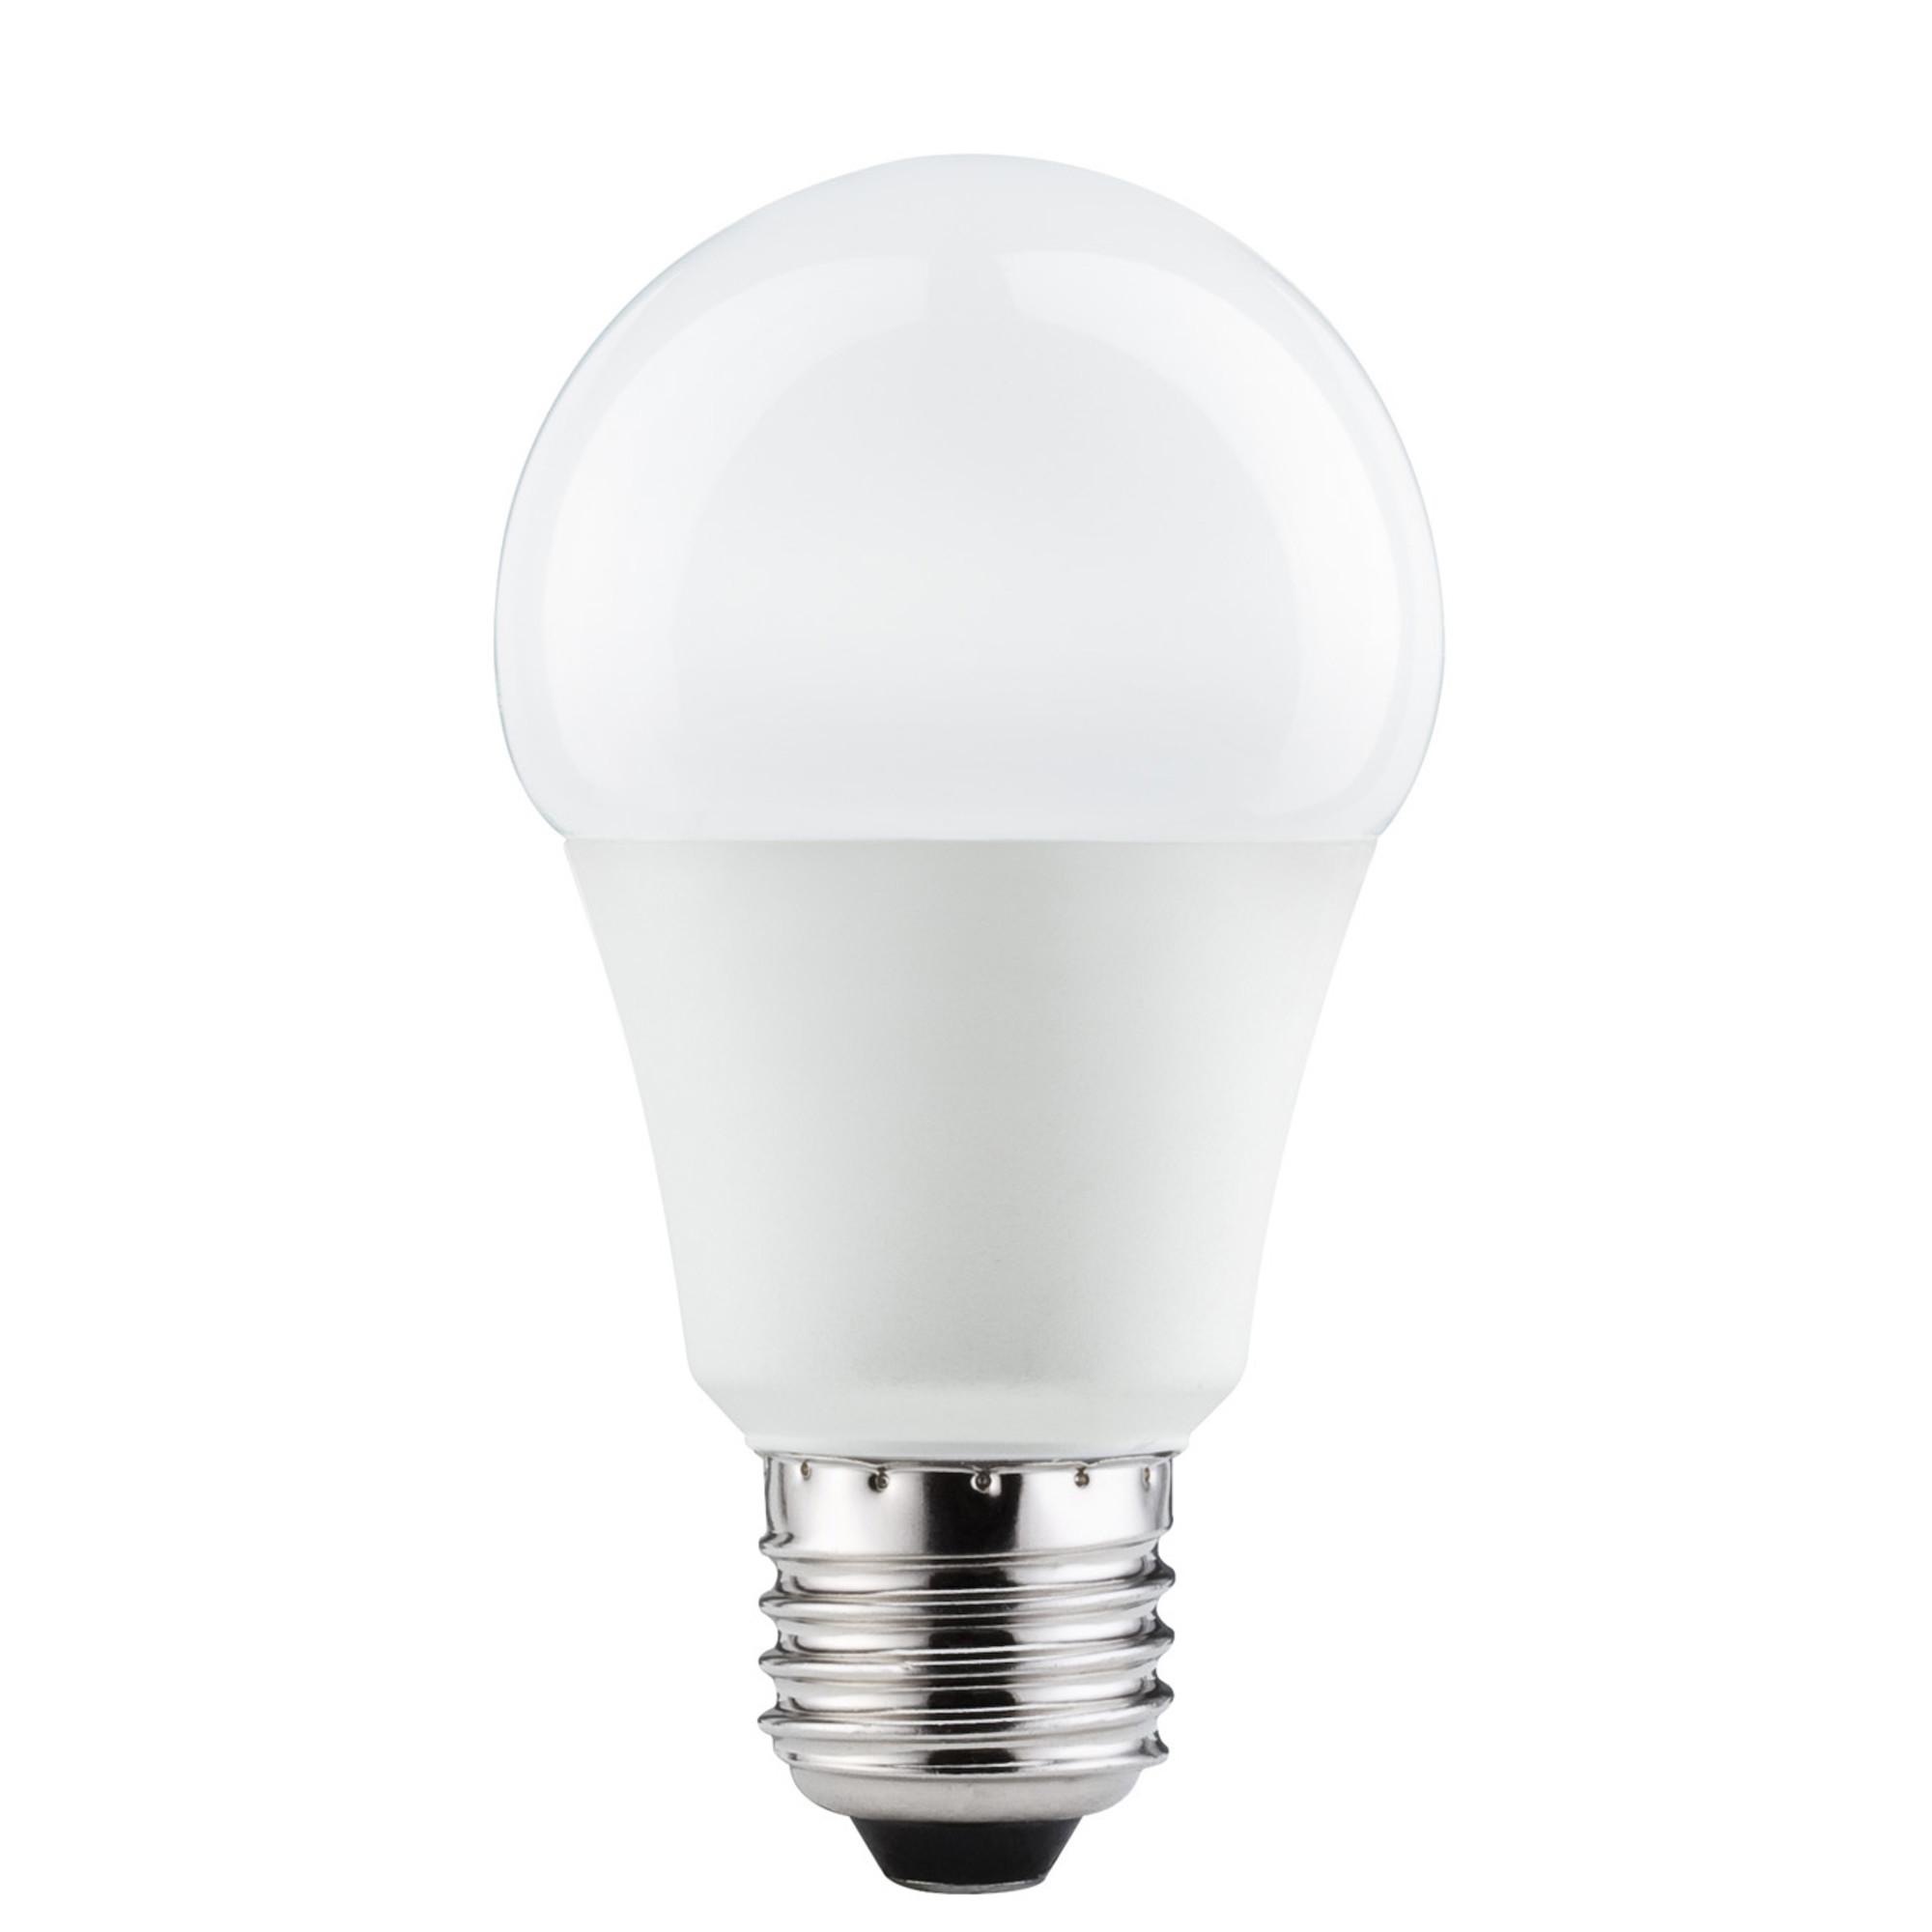 Лампа светодиодная Paulmann 28228 E27 470 Лм теплый свет